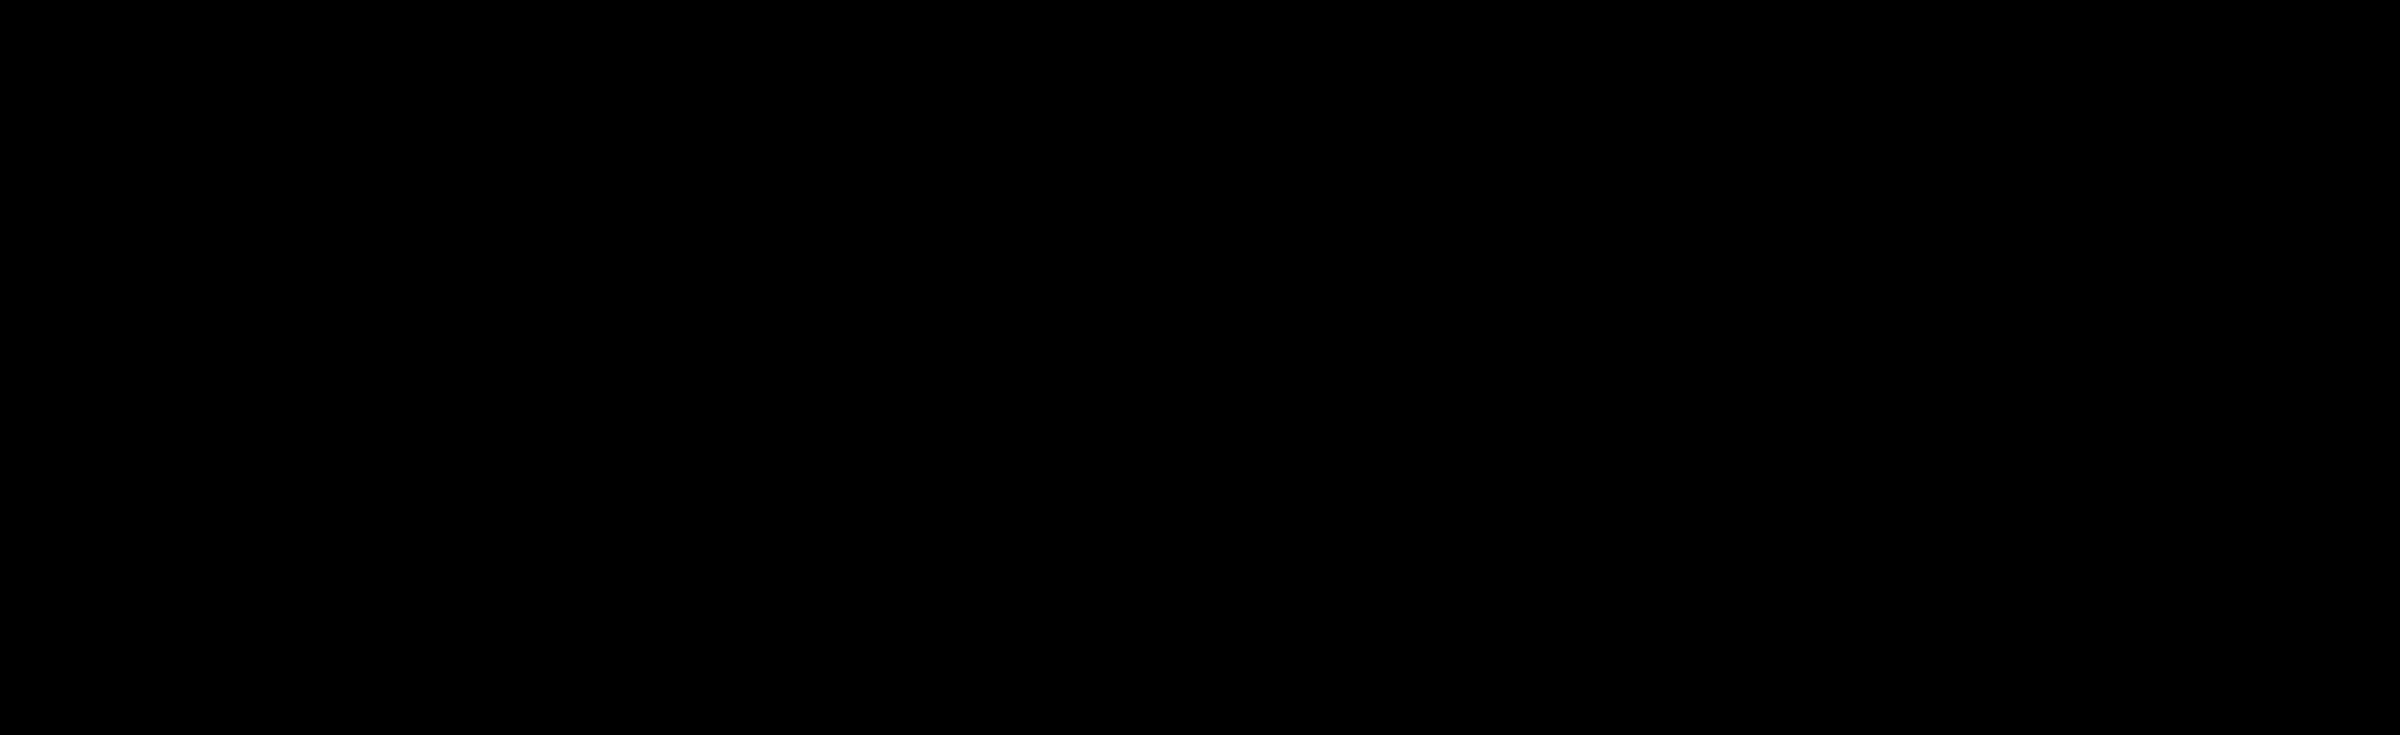 lucky-brand-17-logo-png-transparent.png